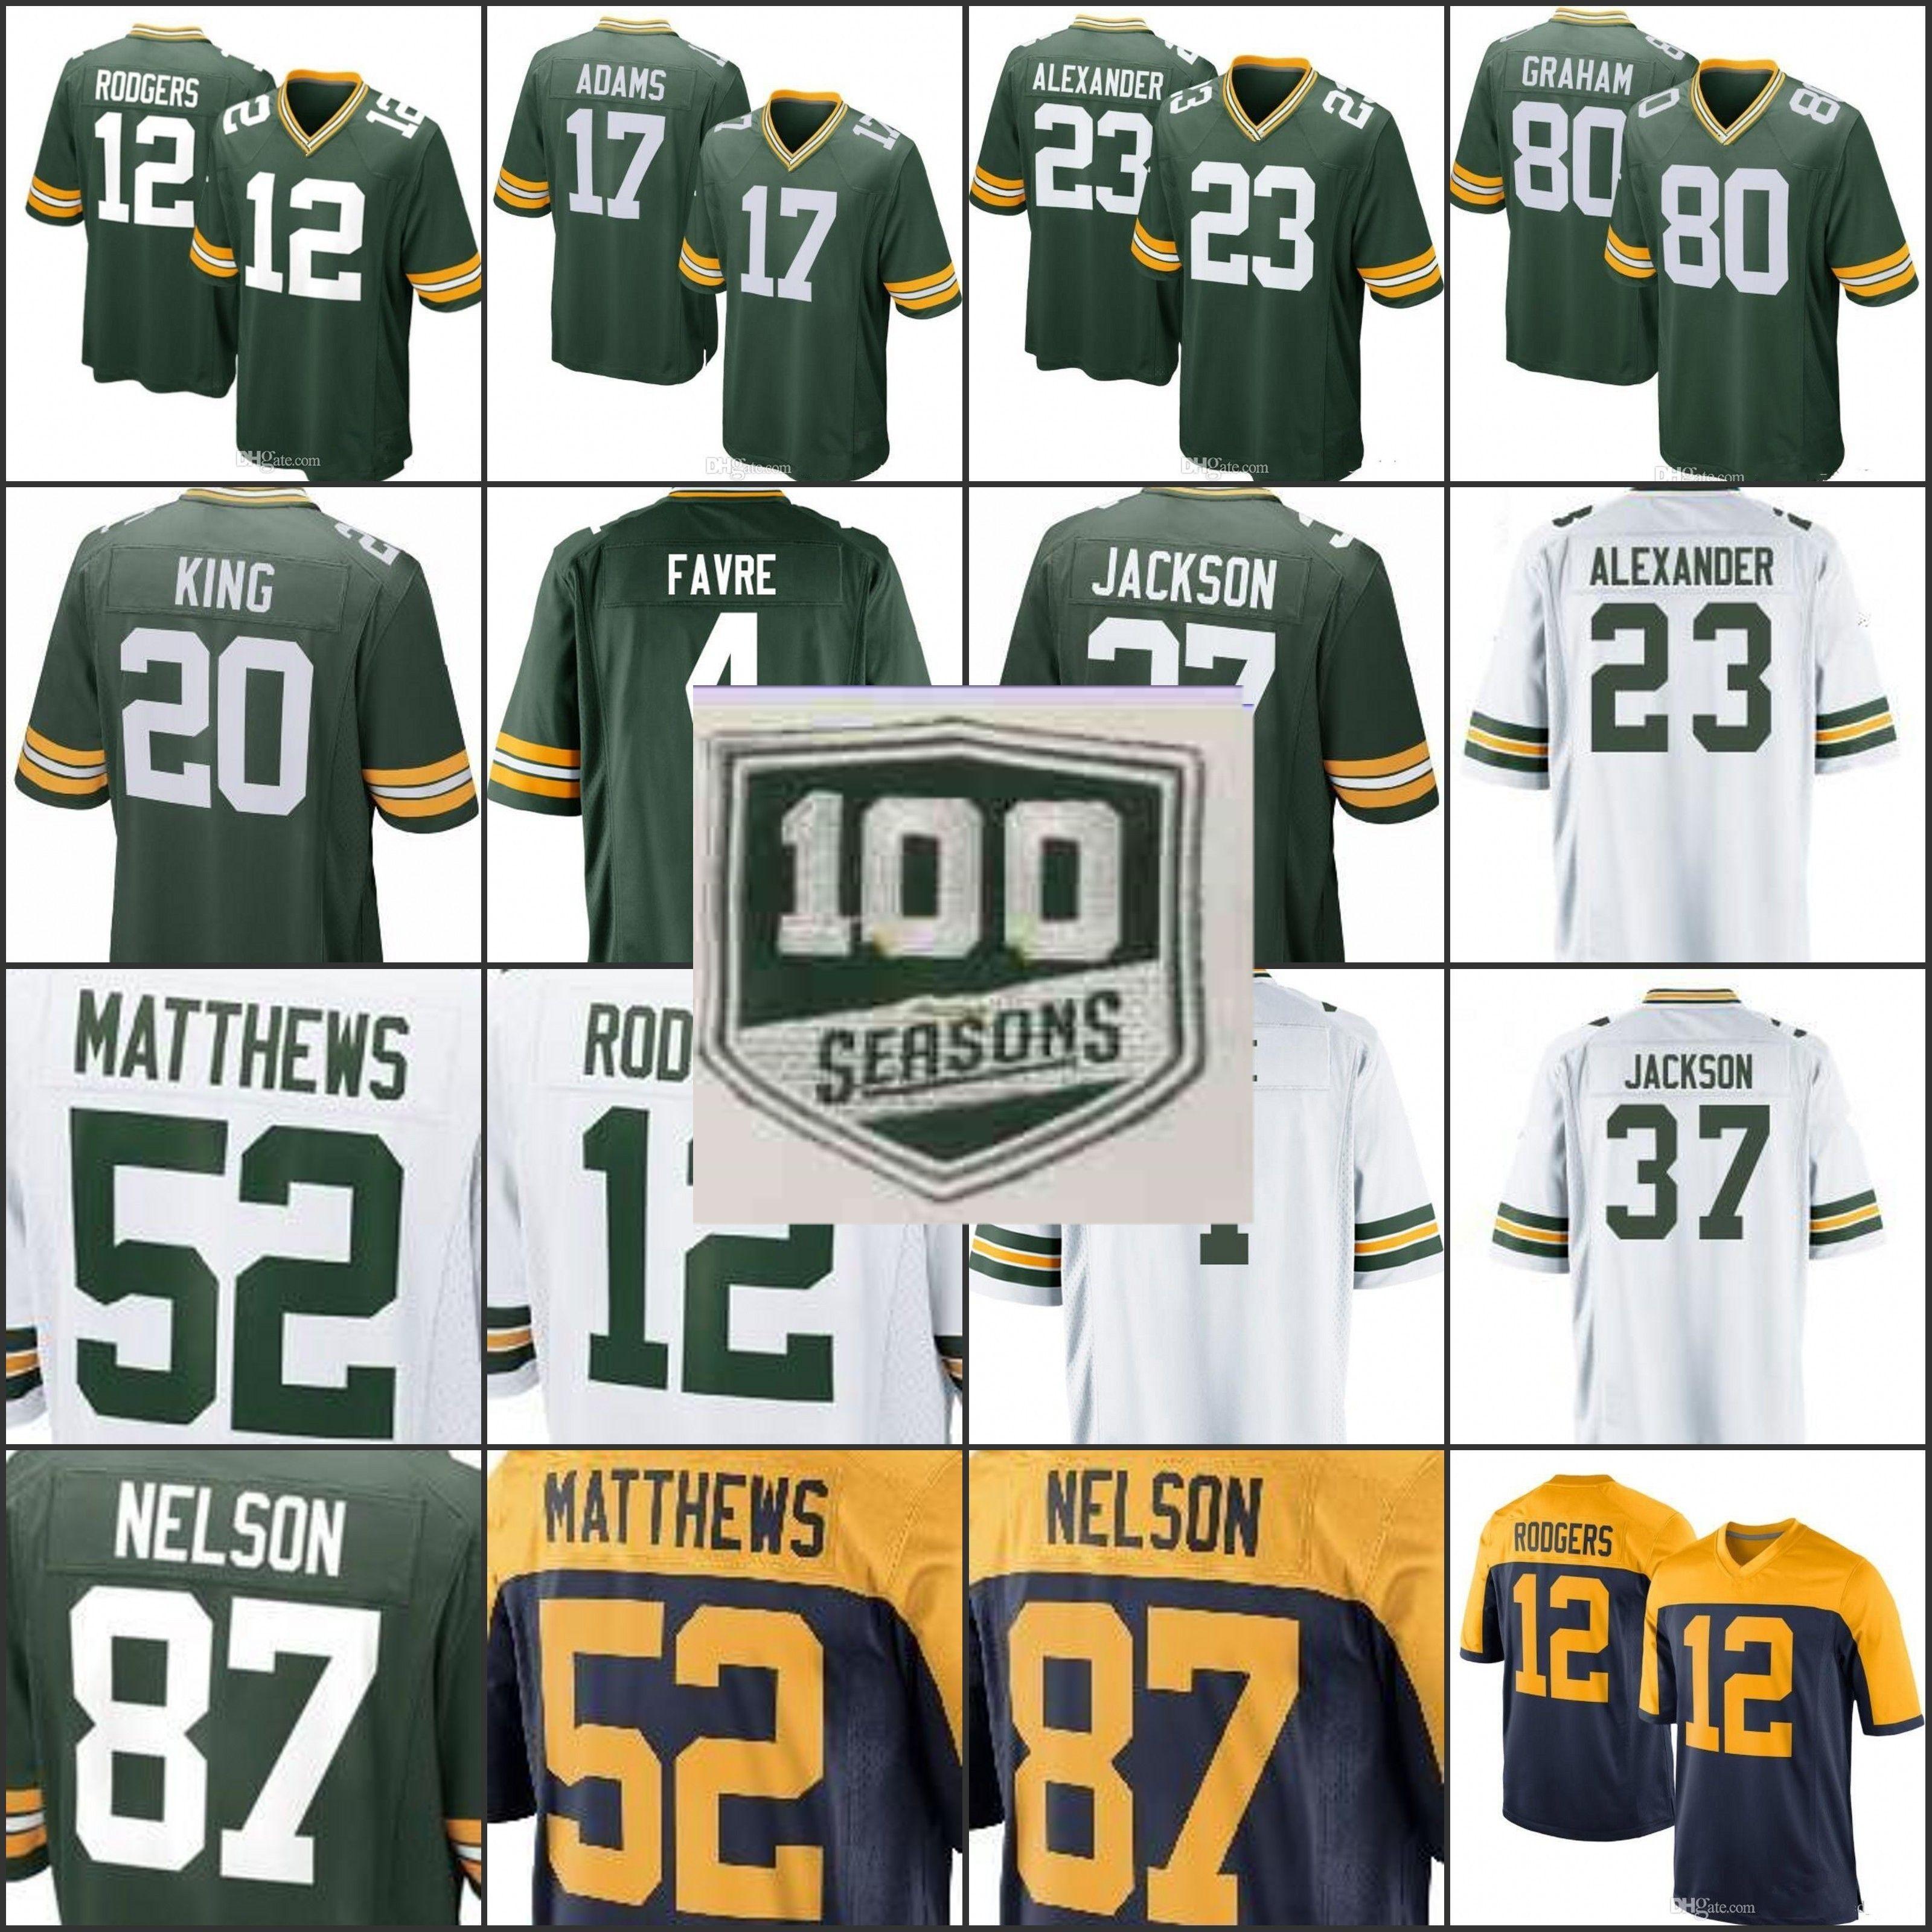 on sale bda8d 05a97 100th season patch Packers Jersey Jimmy Graham 12 Aaron Rodgers Jaire  Alexander Jackson Brett Favre Davante Adams Clay Matthews 01